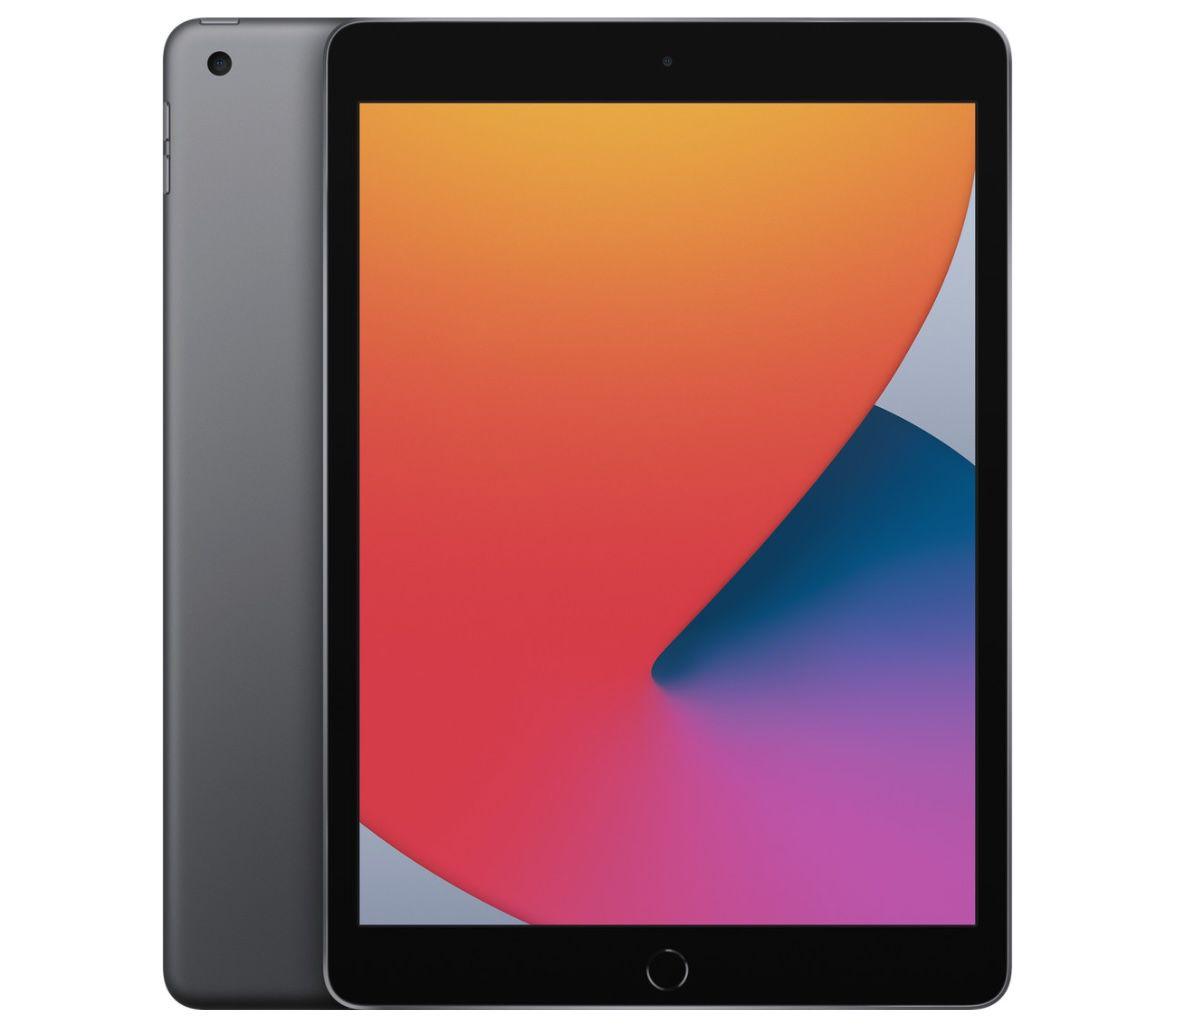 eBay: 10% Rabatt auf div. Elektronik/Technik/Gaming   z.B. Apple iPad (2020) 32GB für 314,91€ (statt 344€)